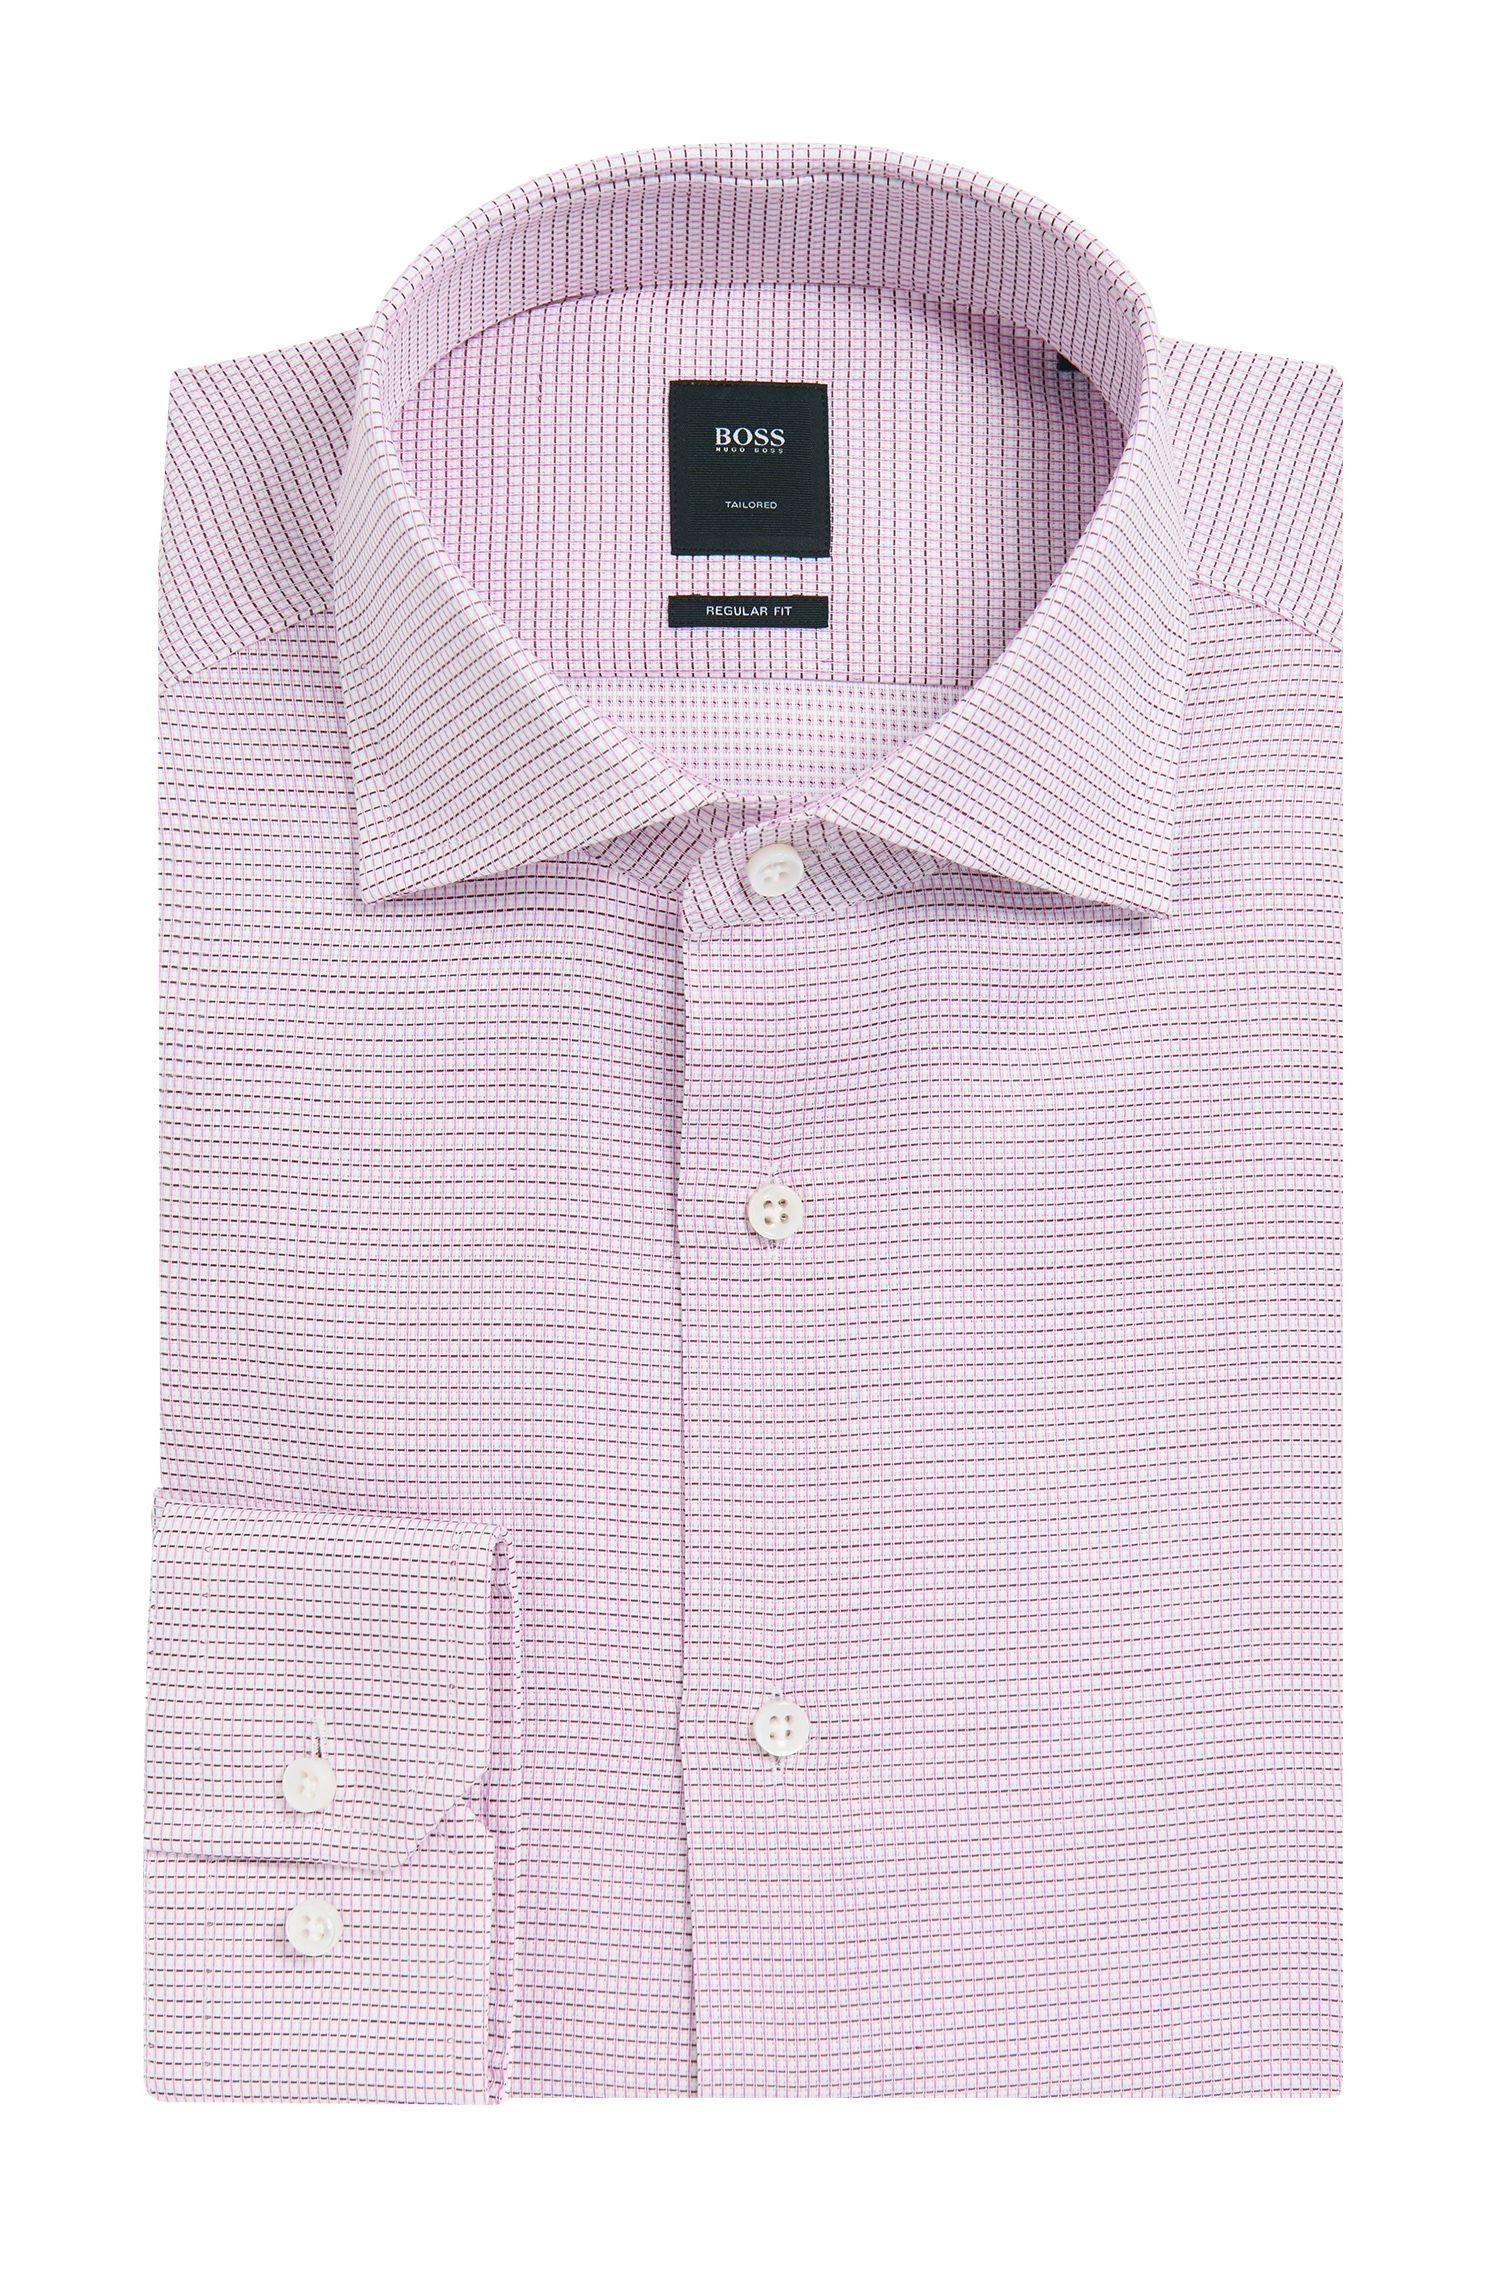 Basketweave Italian Cotton Dress Shirt, Slim Fit | T-Stenson